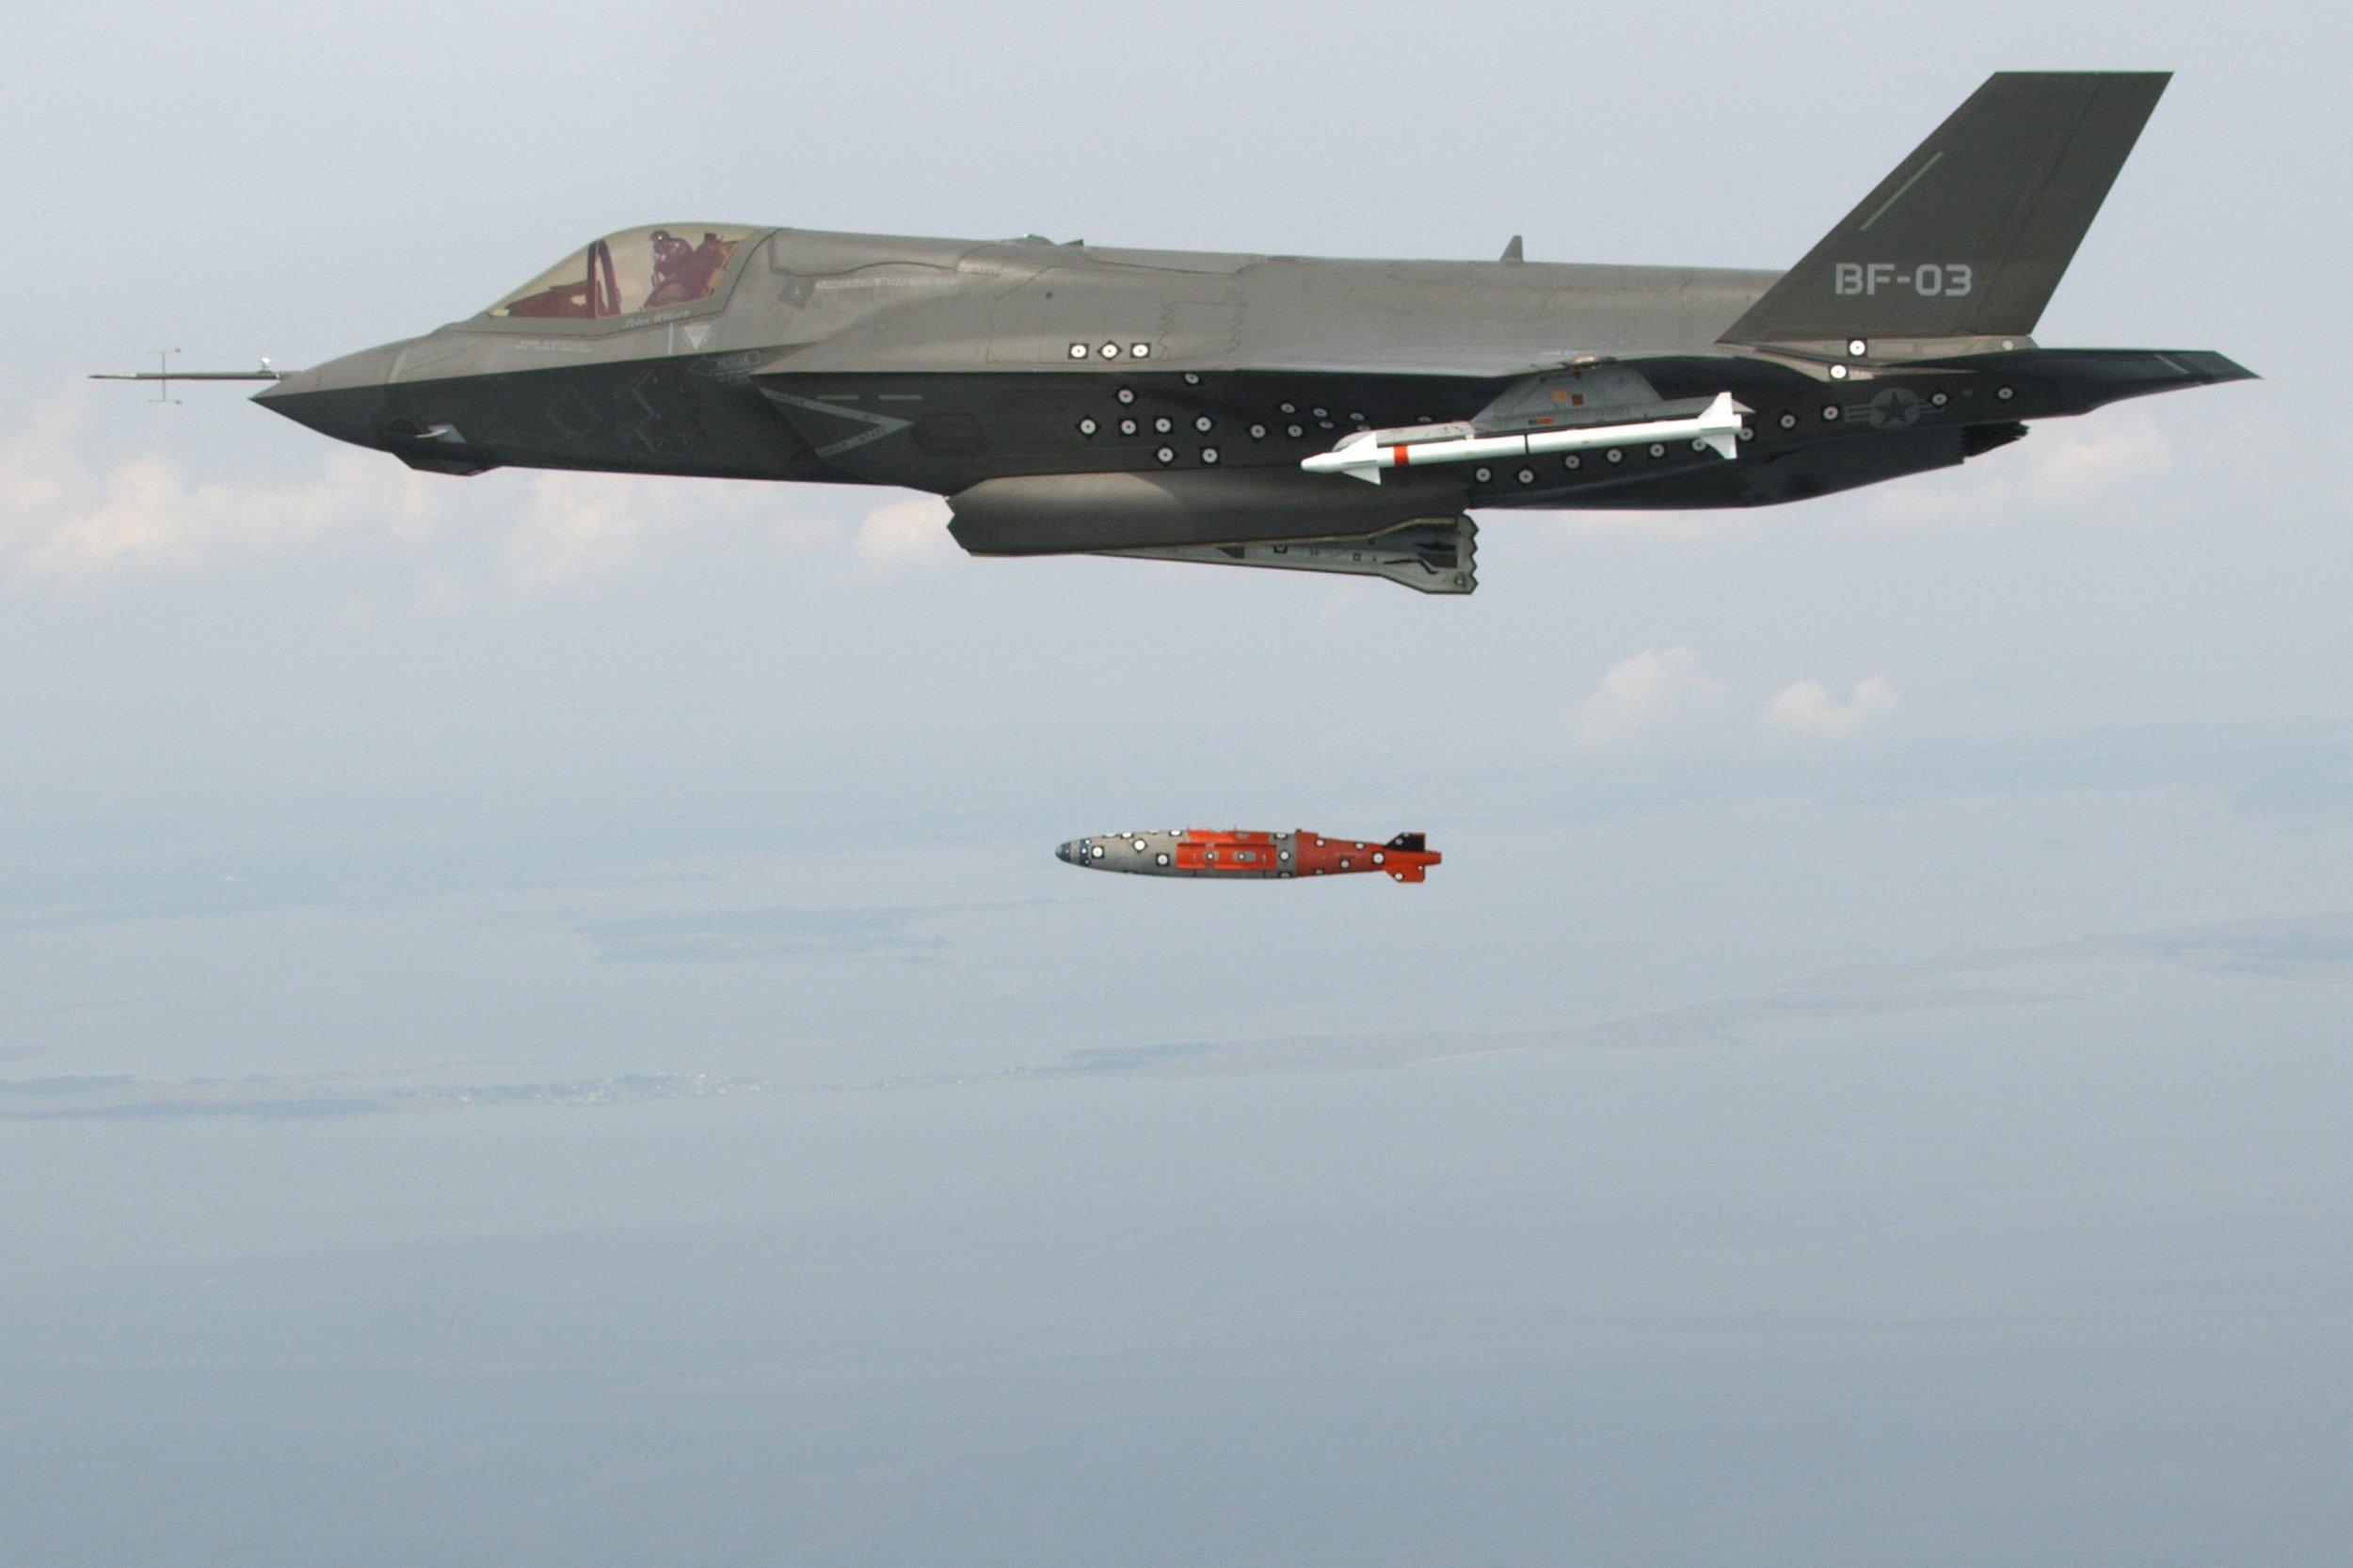 Lockheed Martin Corp F-35 Joint Strike Fighter